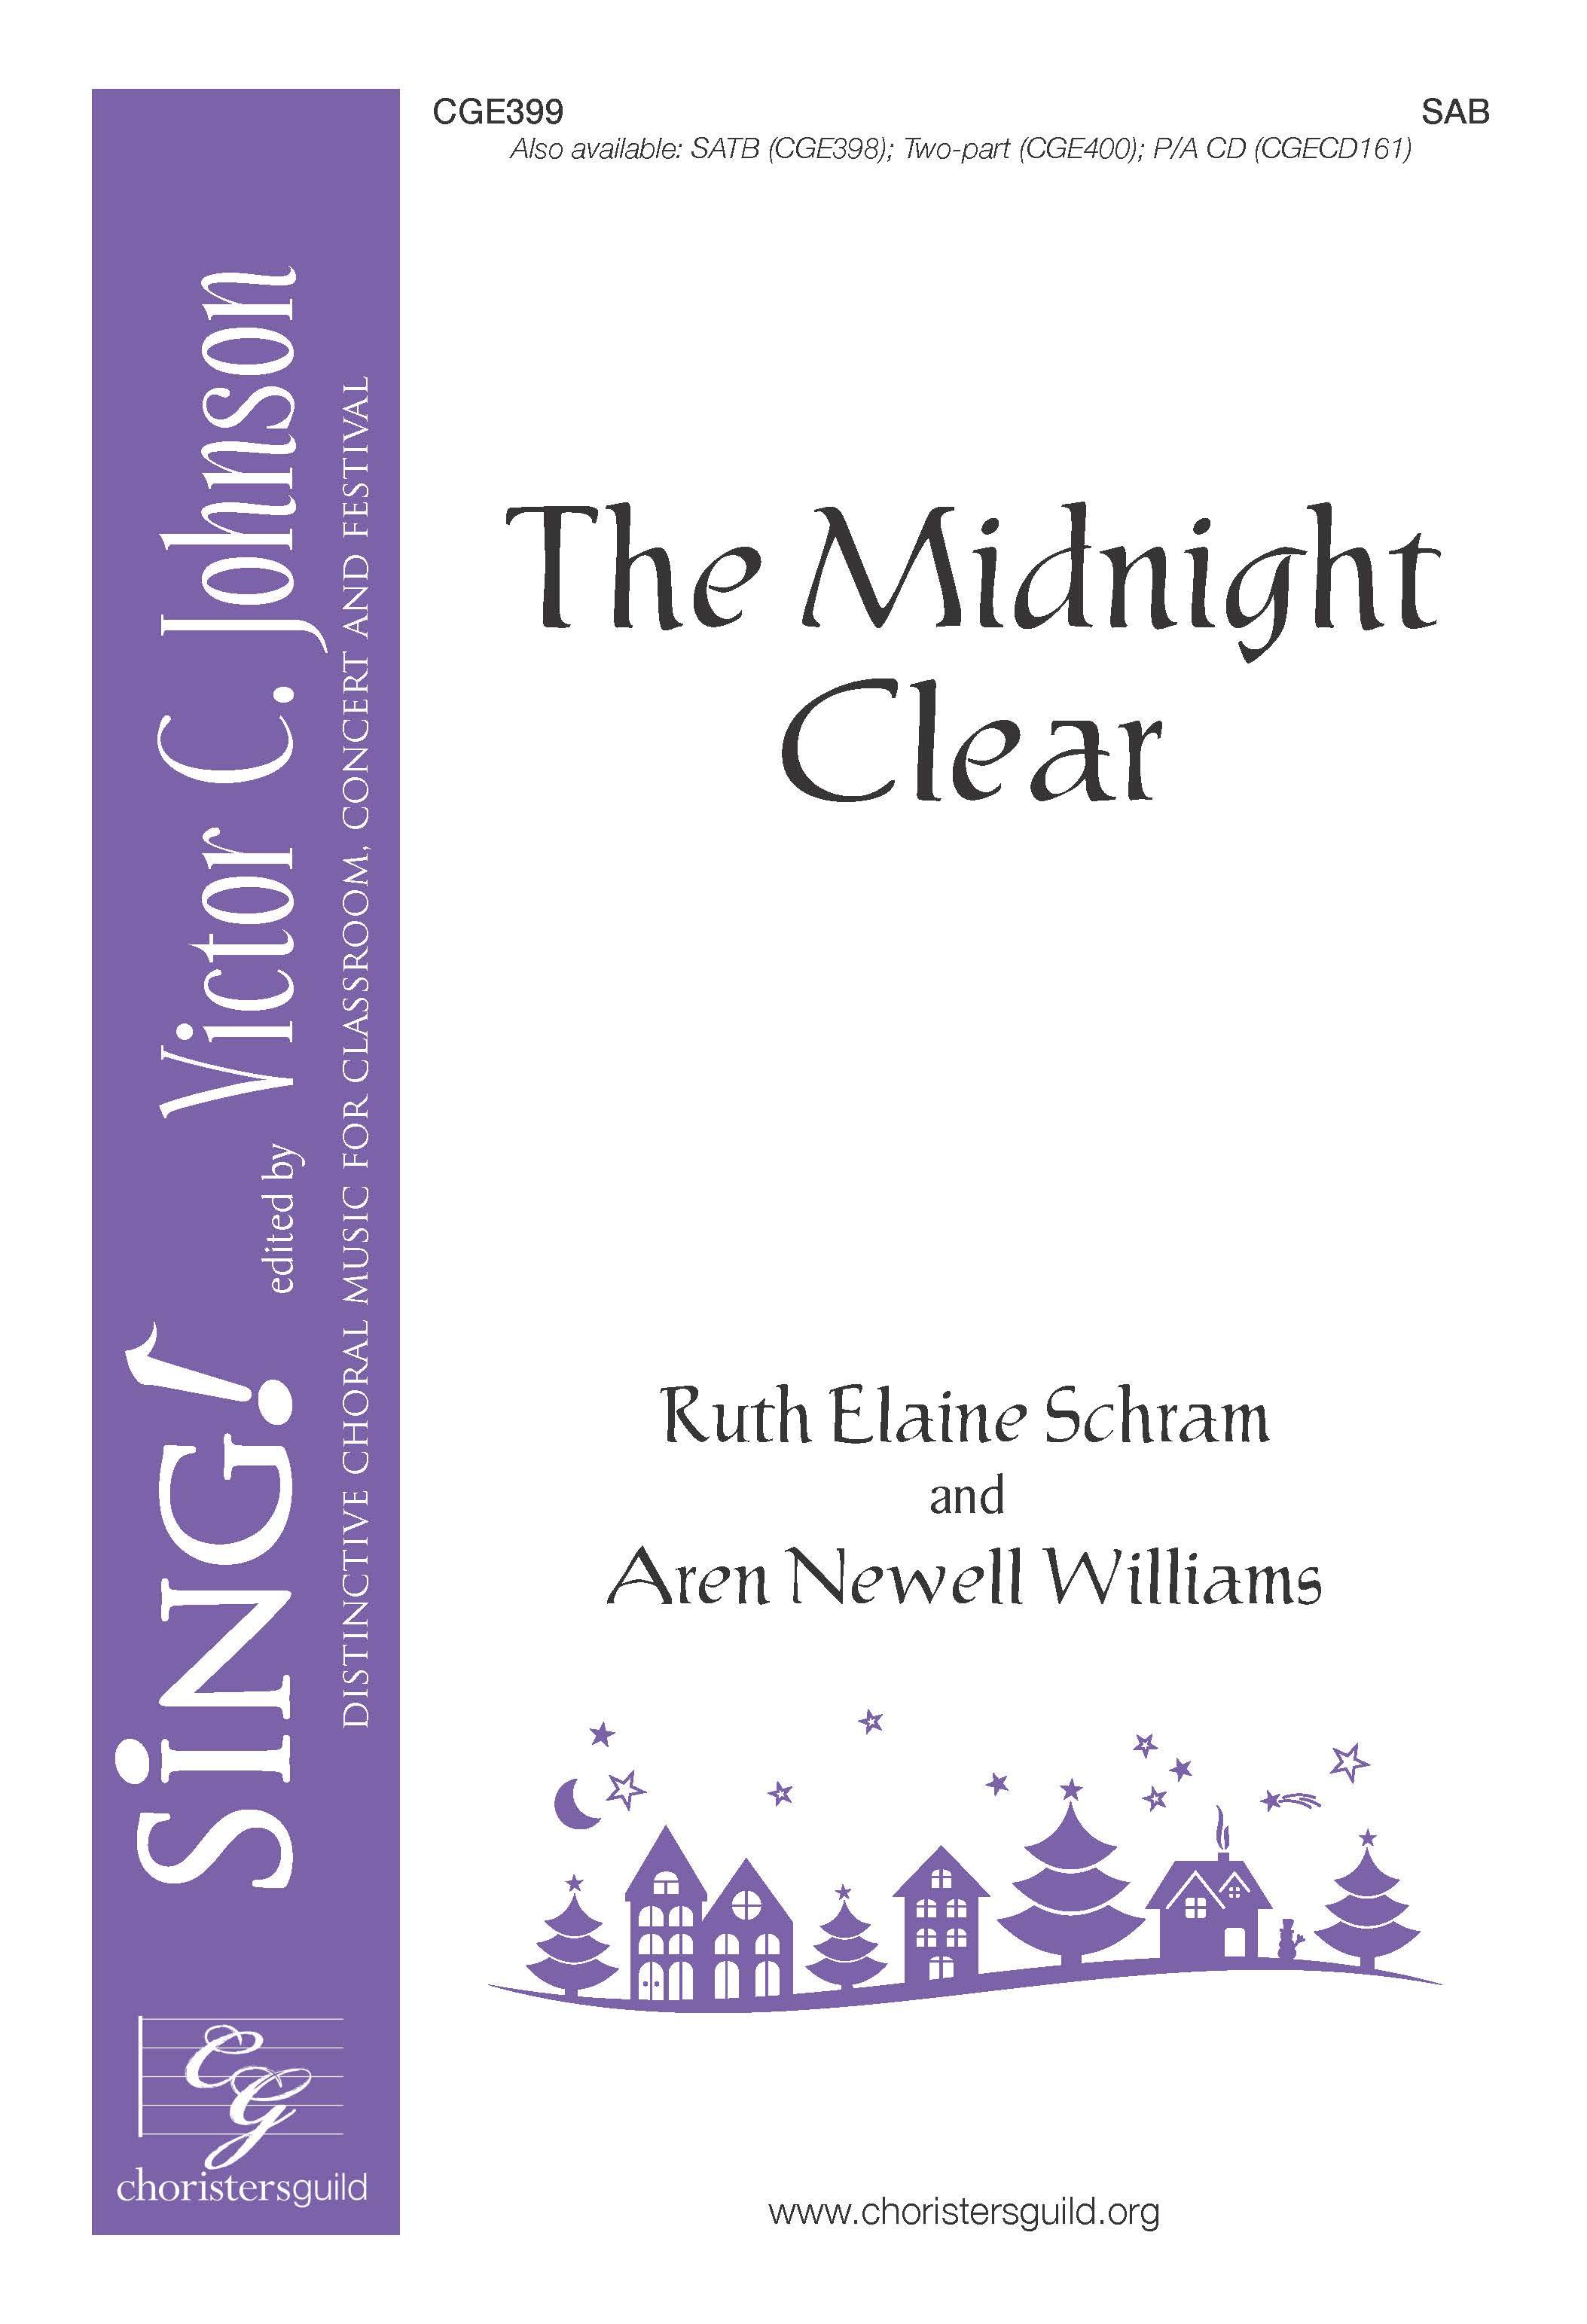 The Midnight Clear - SAB